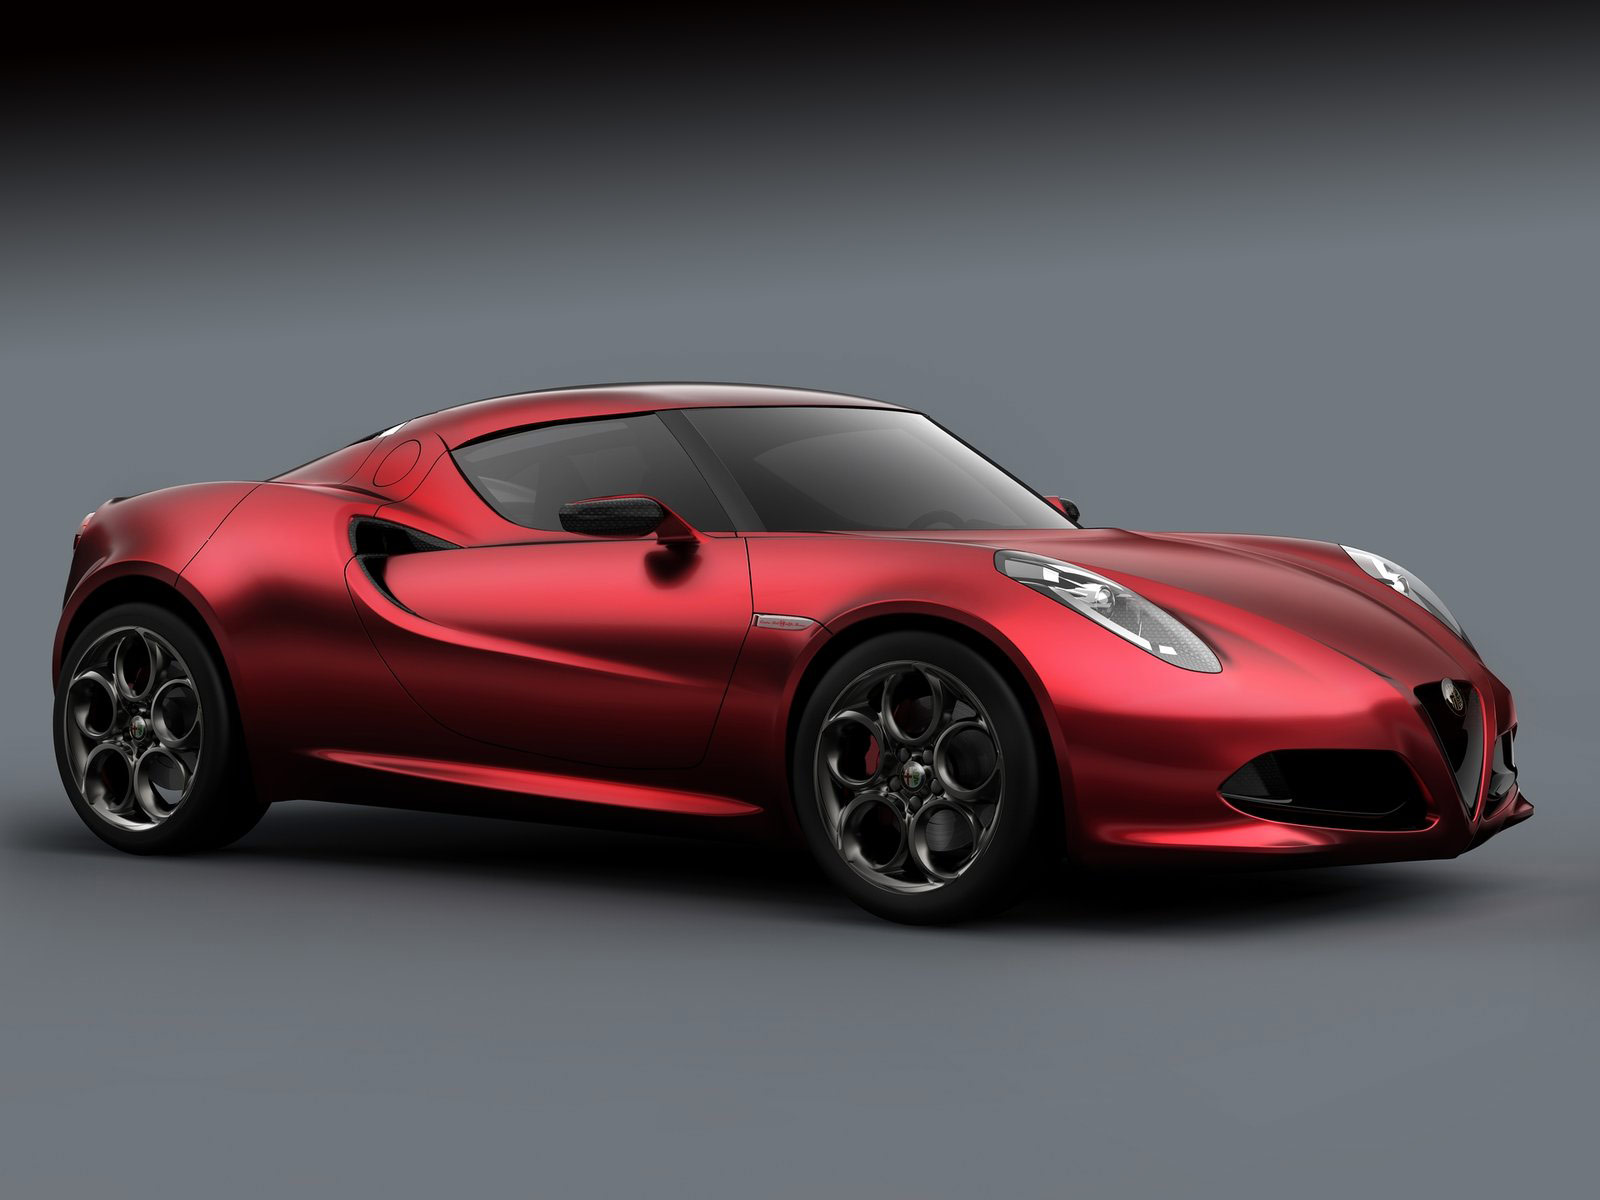 2011 alfa romeo 4c concept car desktop wallpapers. Black Bedroom Furniture Sets. Home Design Ideas